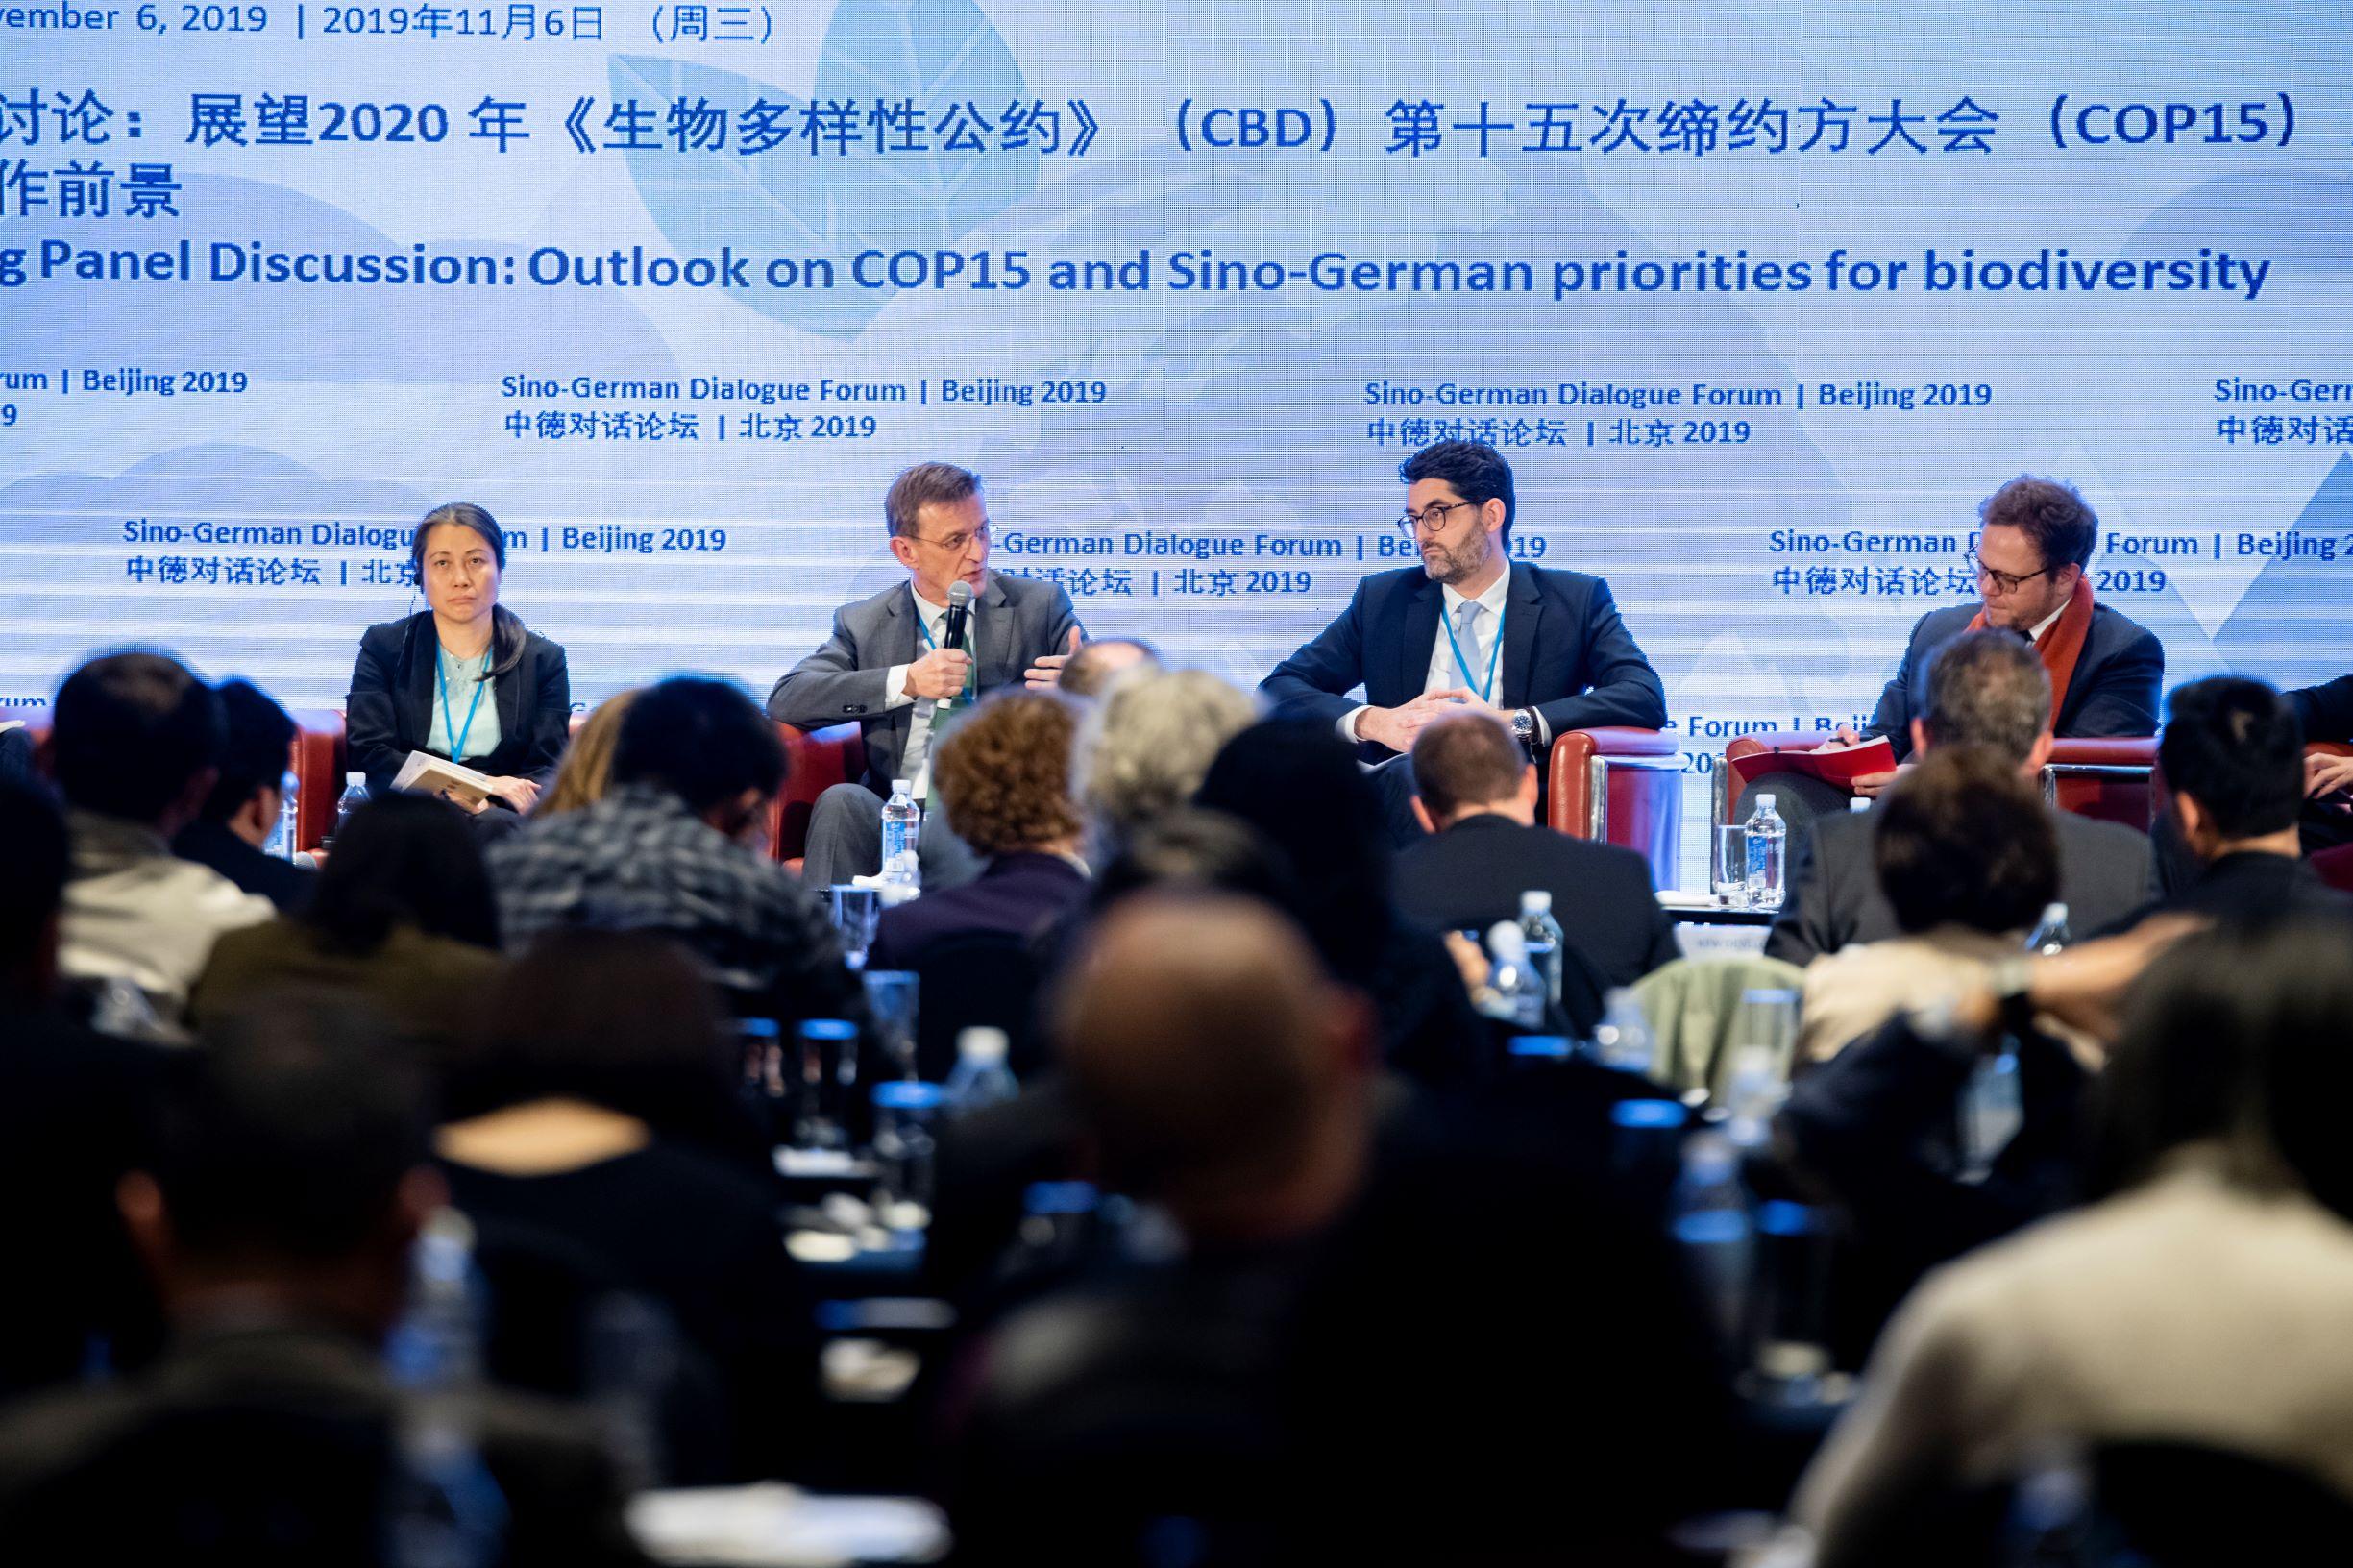 Sino-German Dialogue Forum